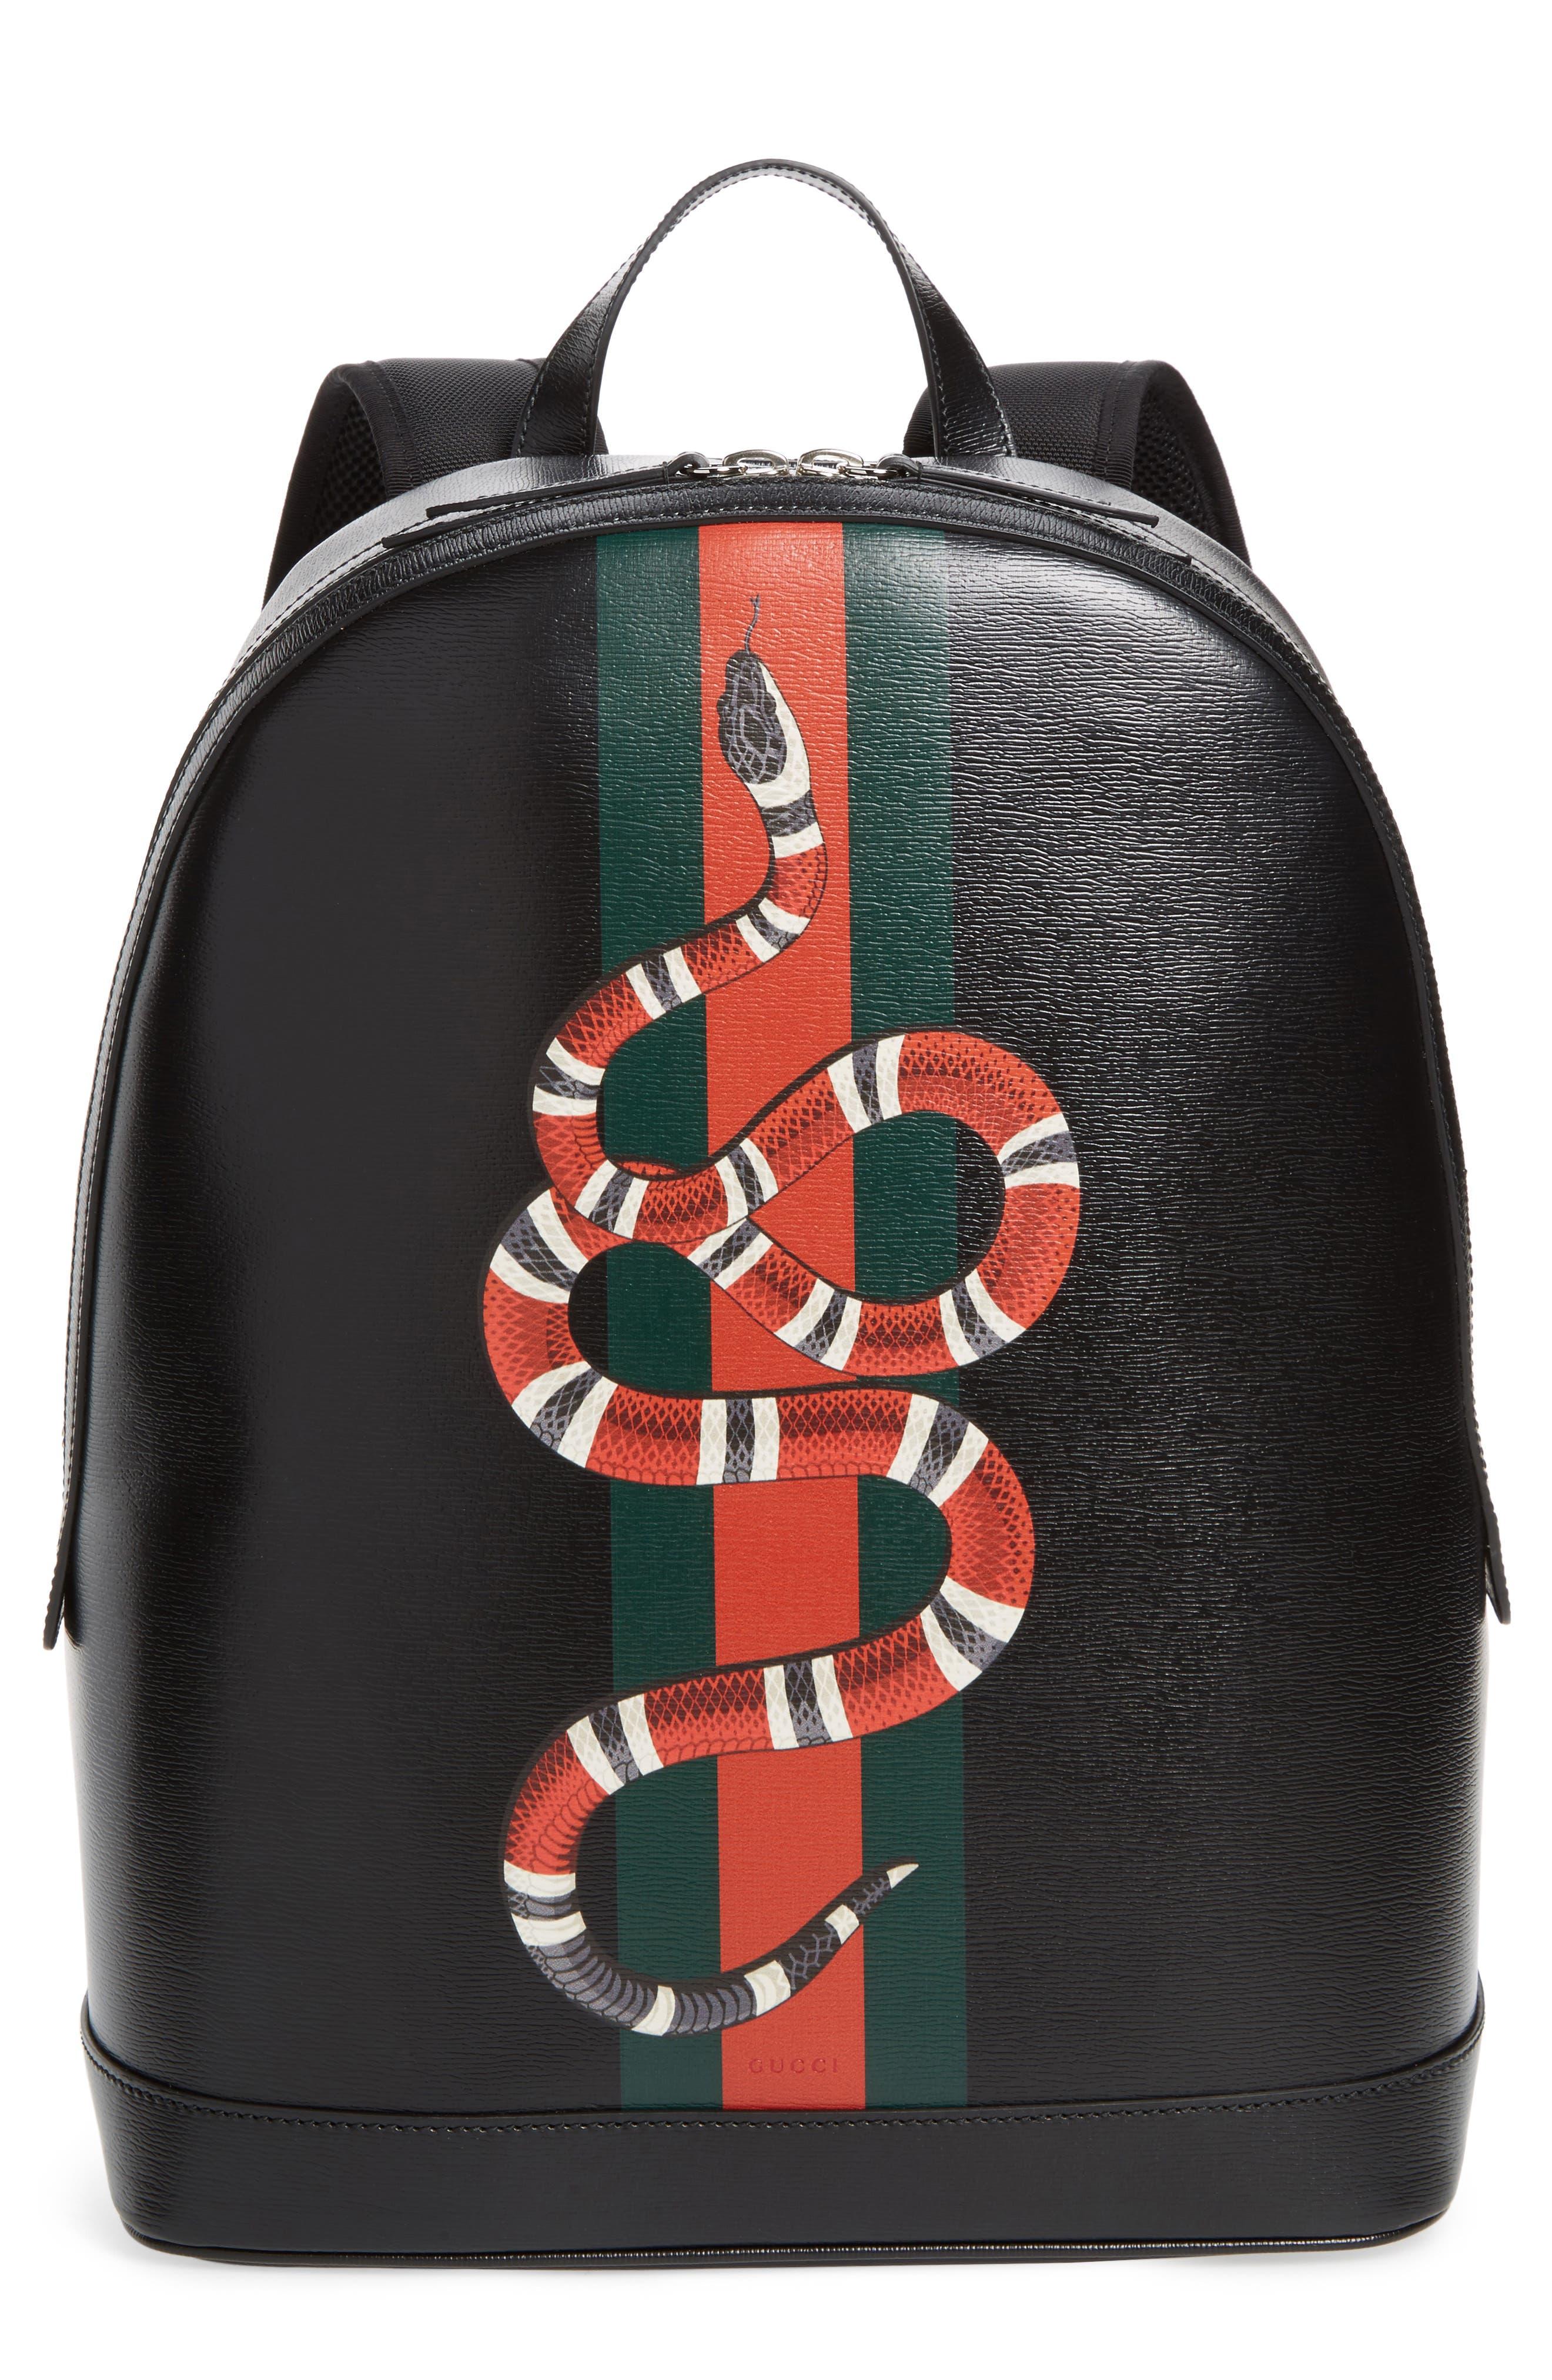 Gucci Snake Print Leather Backpack Nordstrom